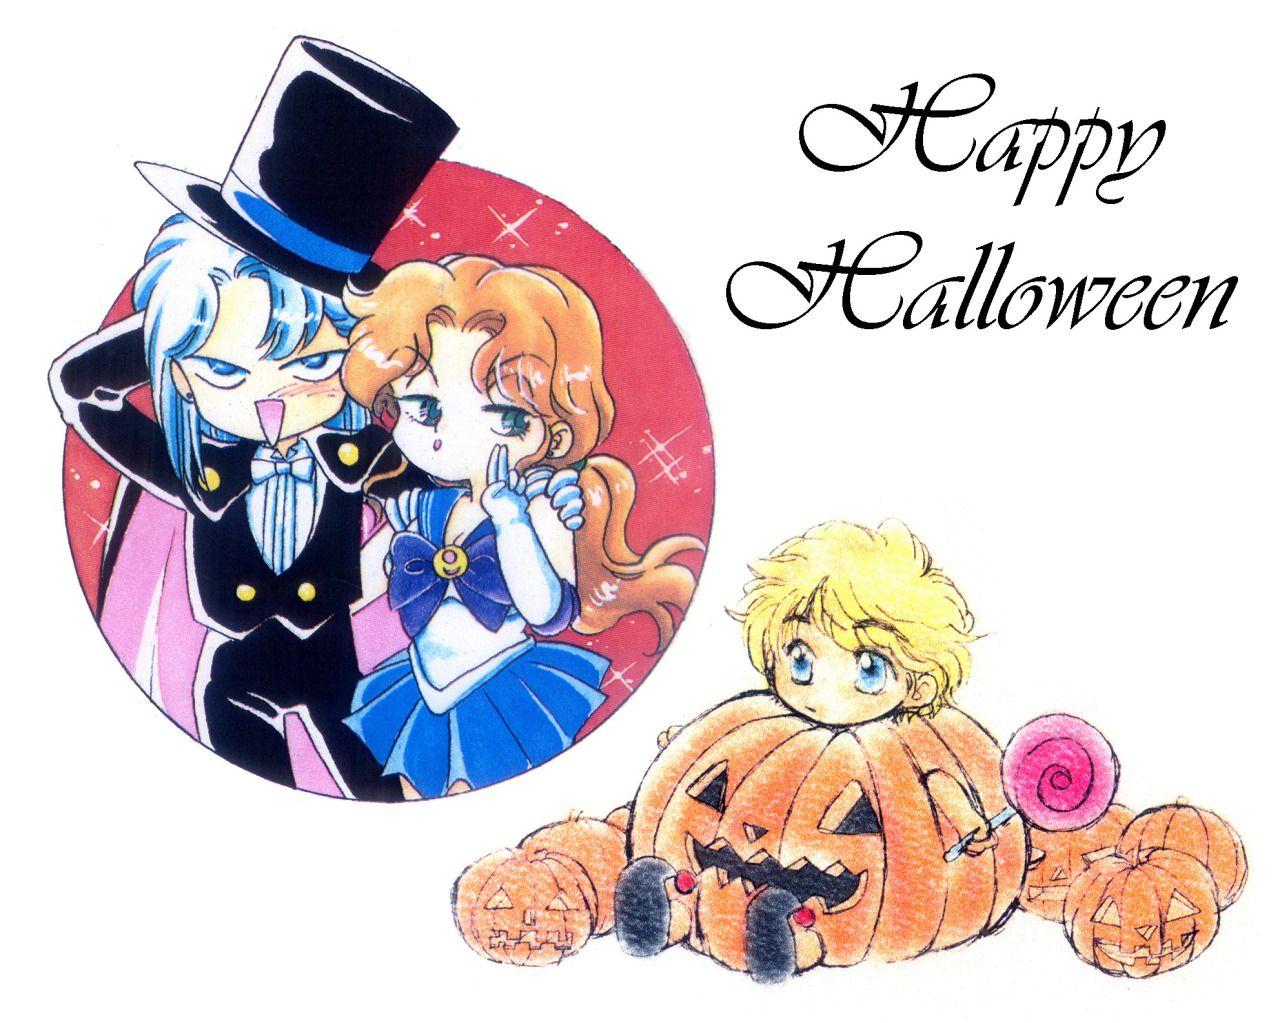 Dark Kingdom Season Sailor moon manga, Sailor moon, Anime